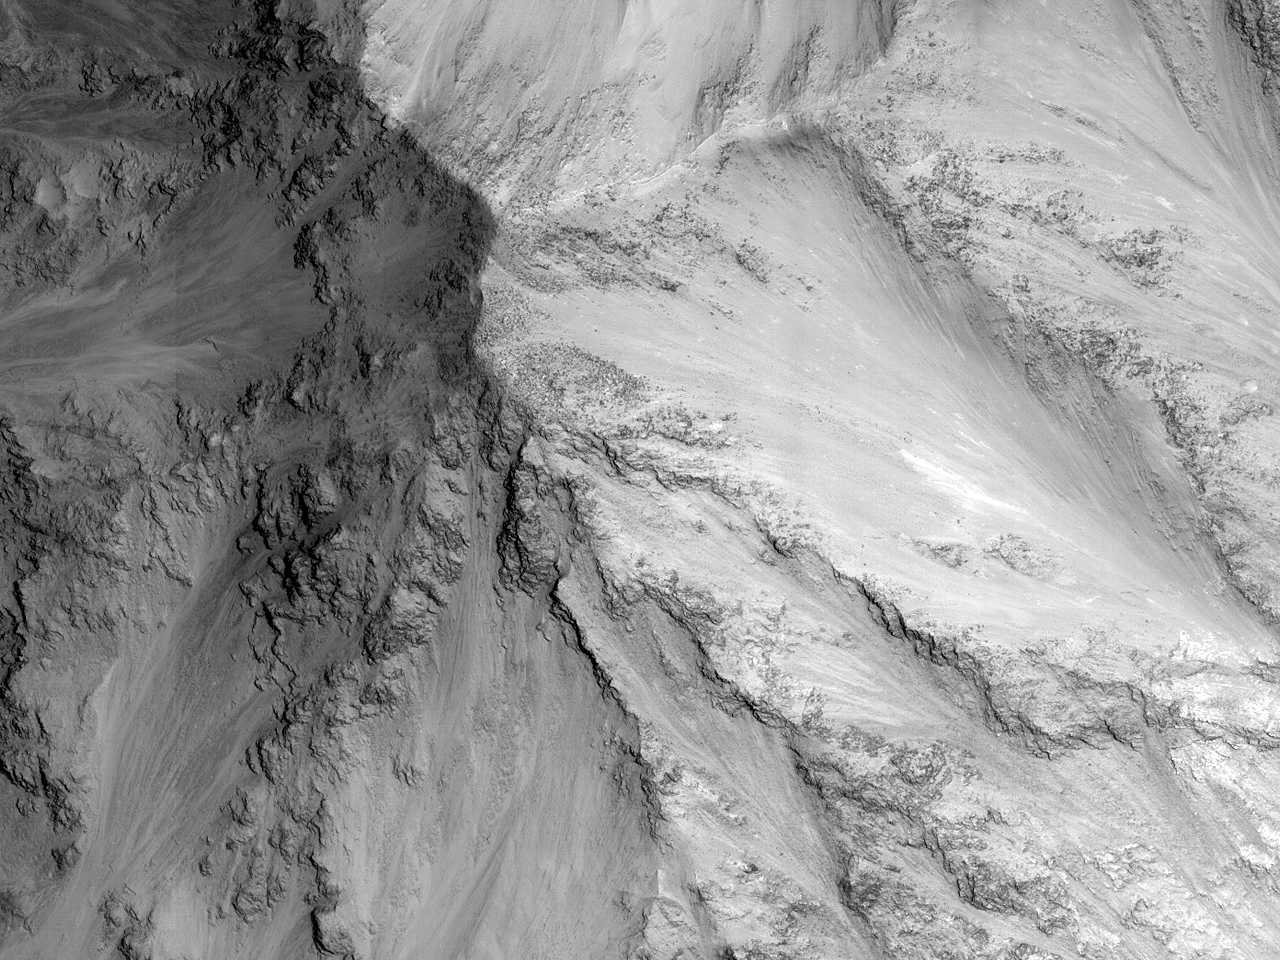 Наблюдения за изменениями склонов каньона Capri Chasma